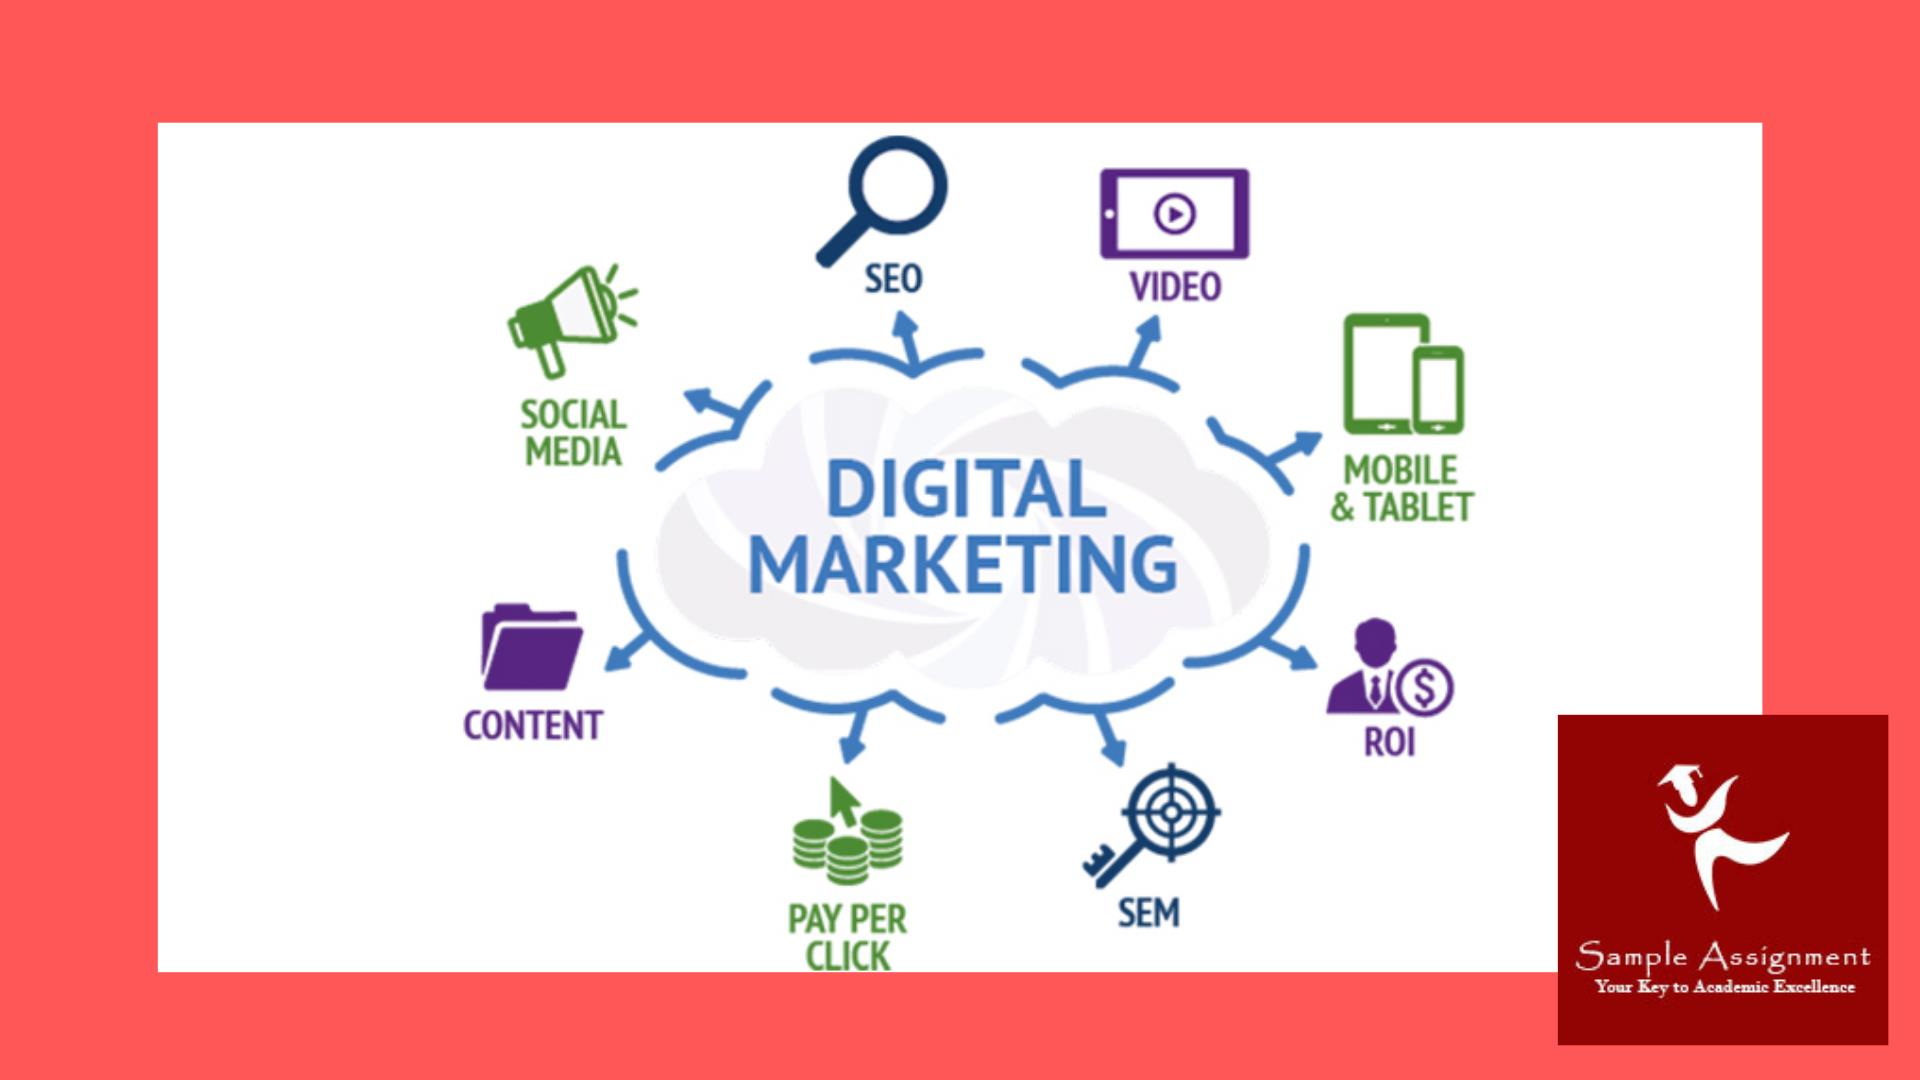 digital marketing academic assistance through online tutoring canada